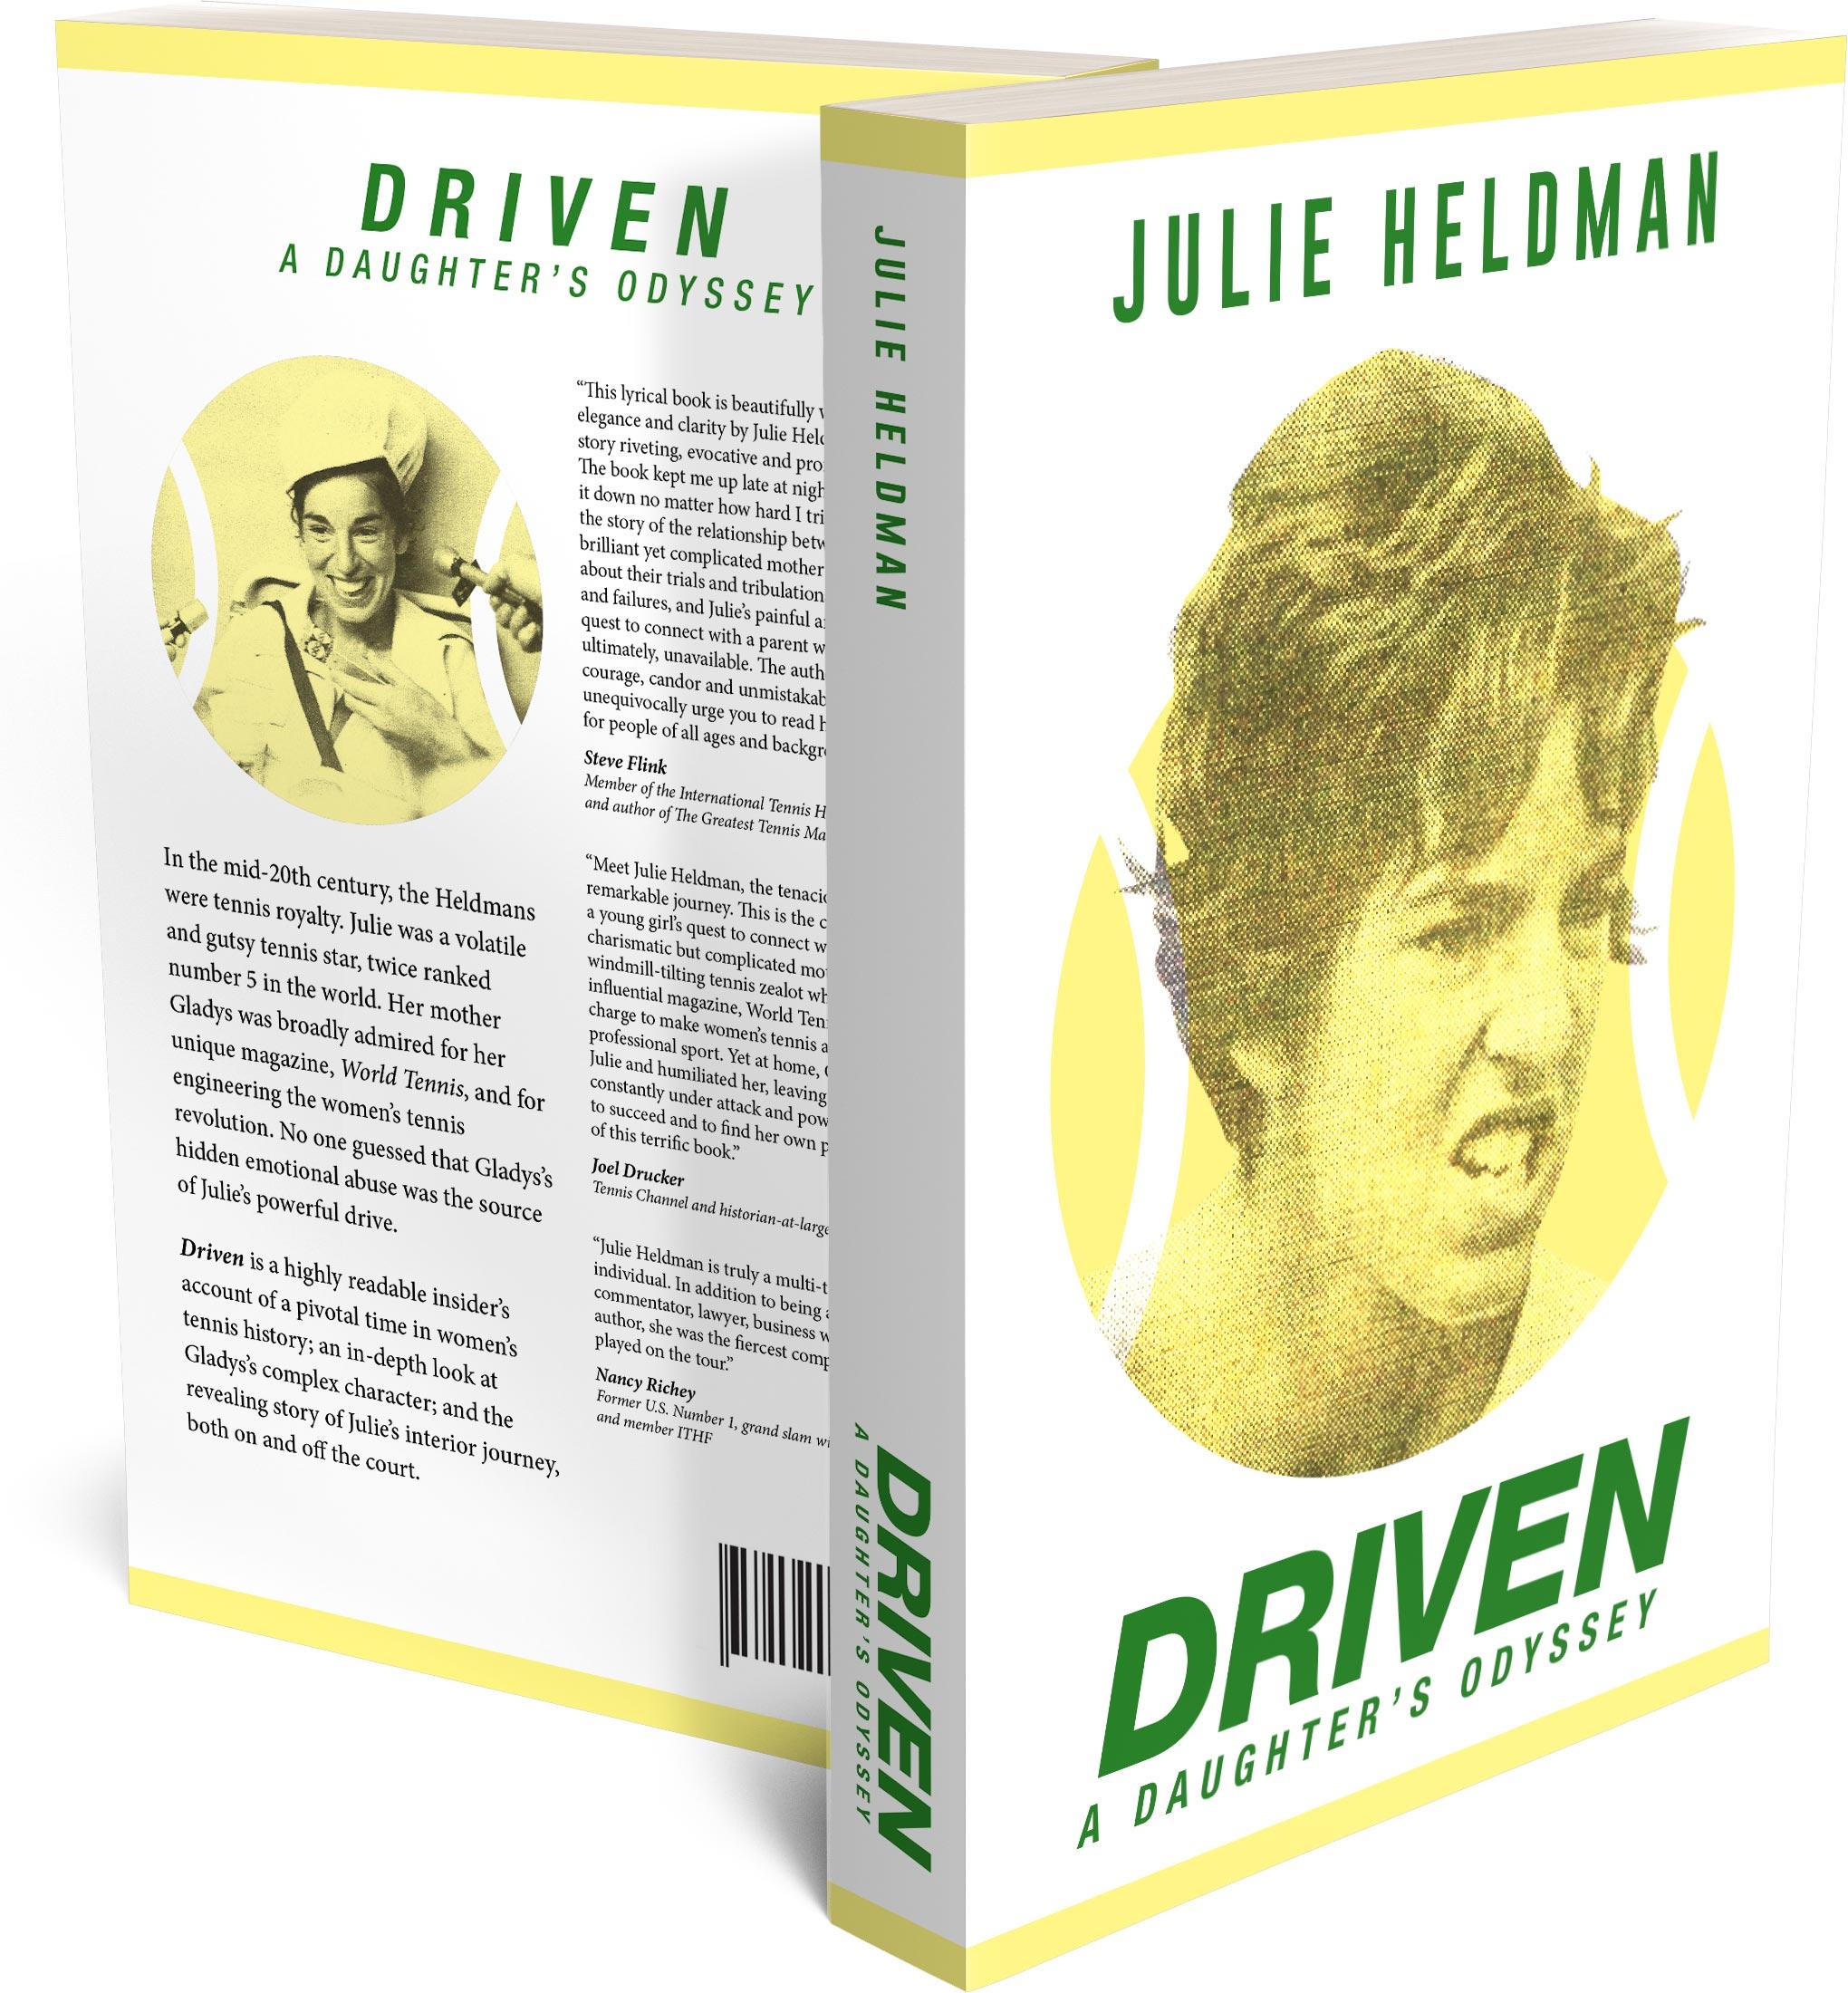 Drive_ADaughtersOdyssey_Book.jpg